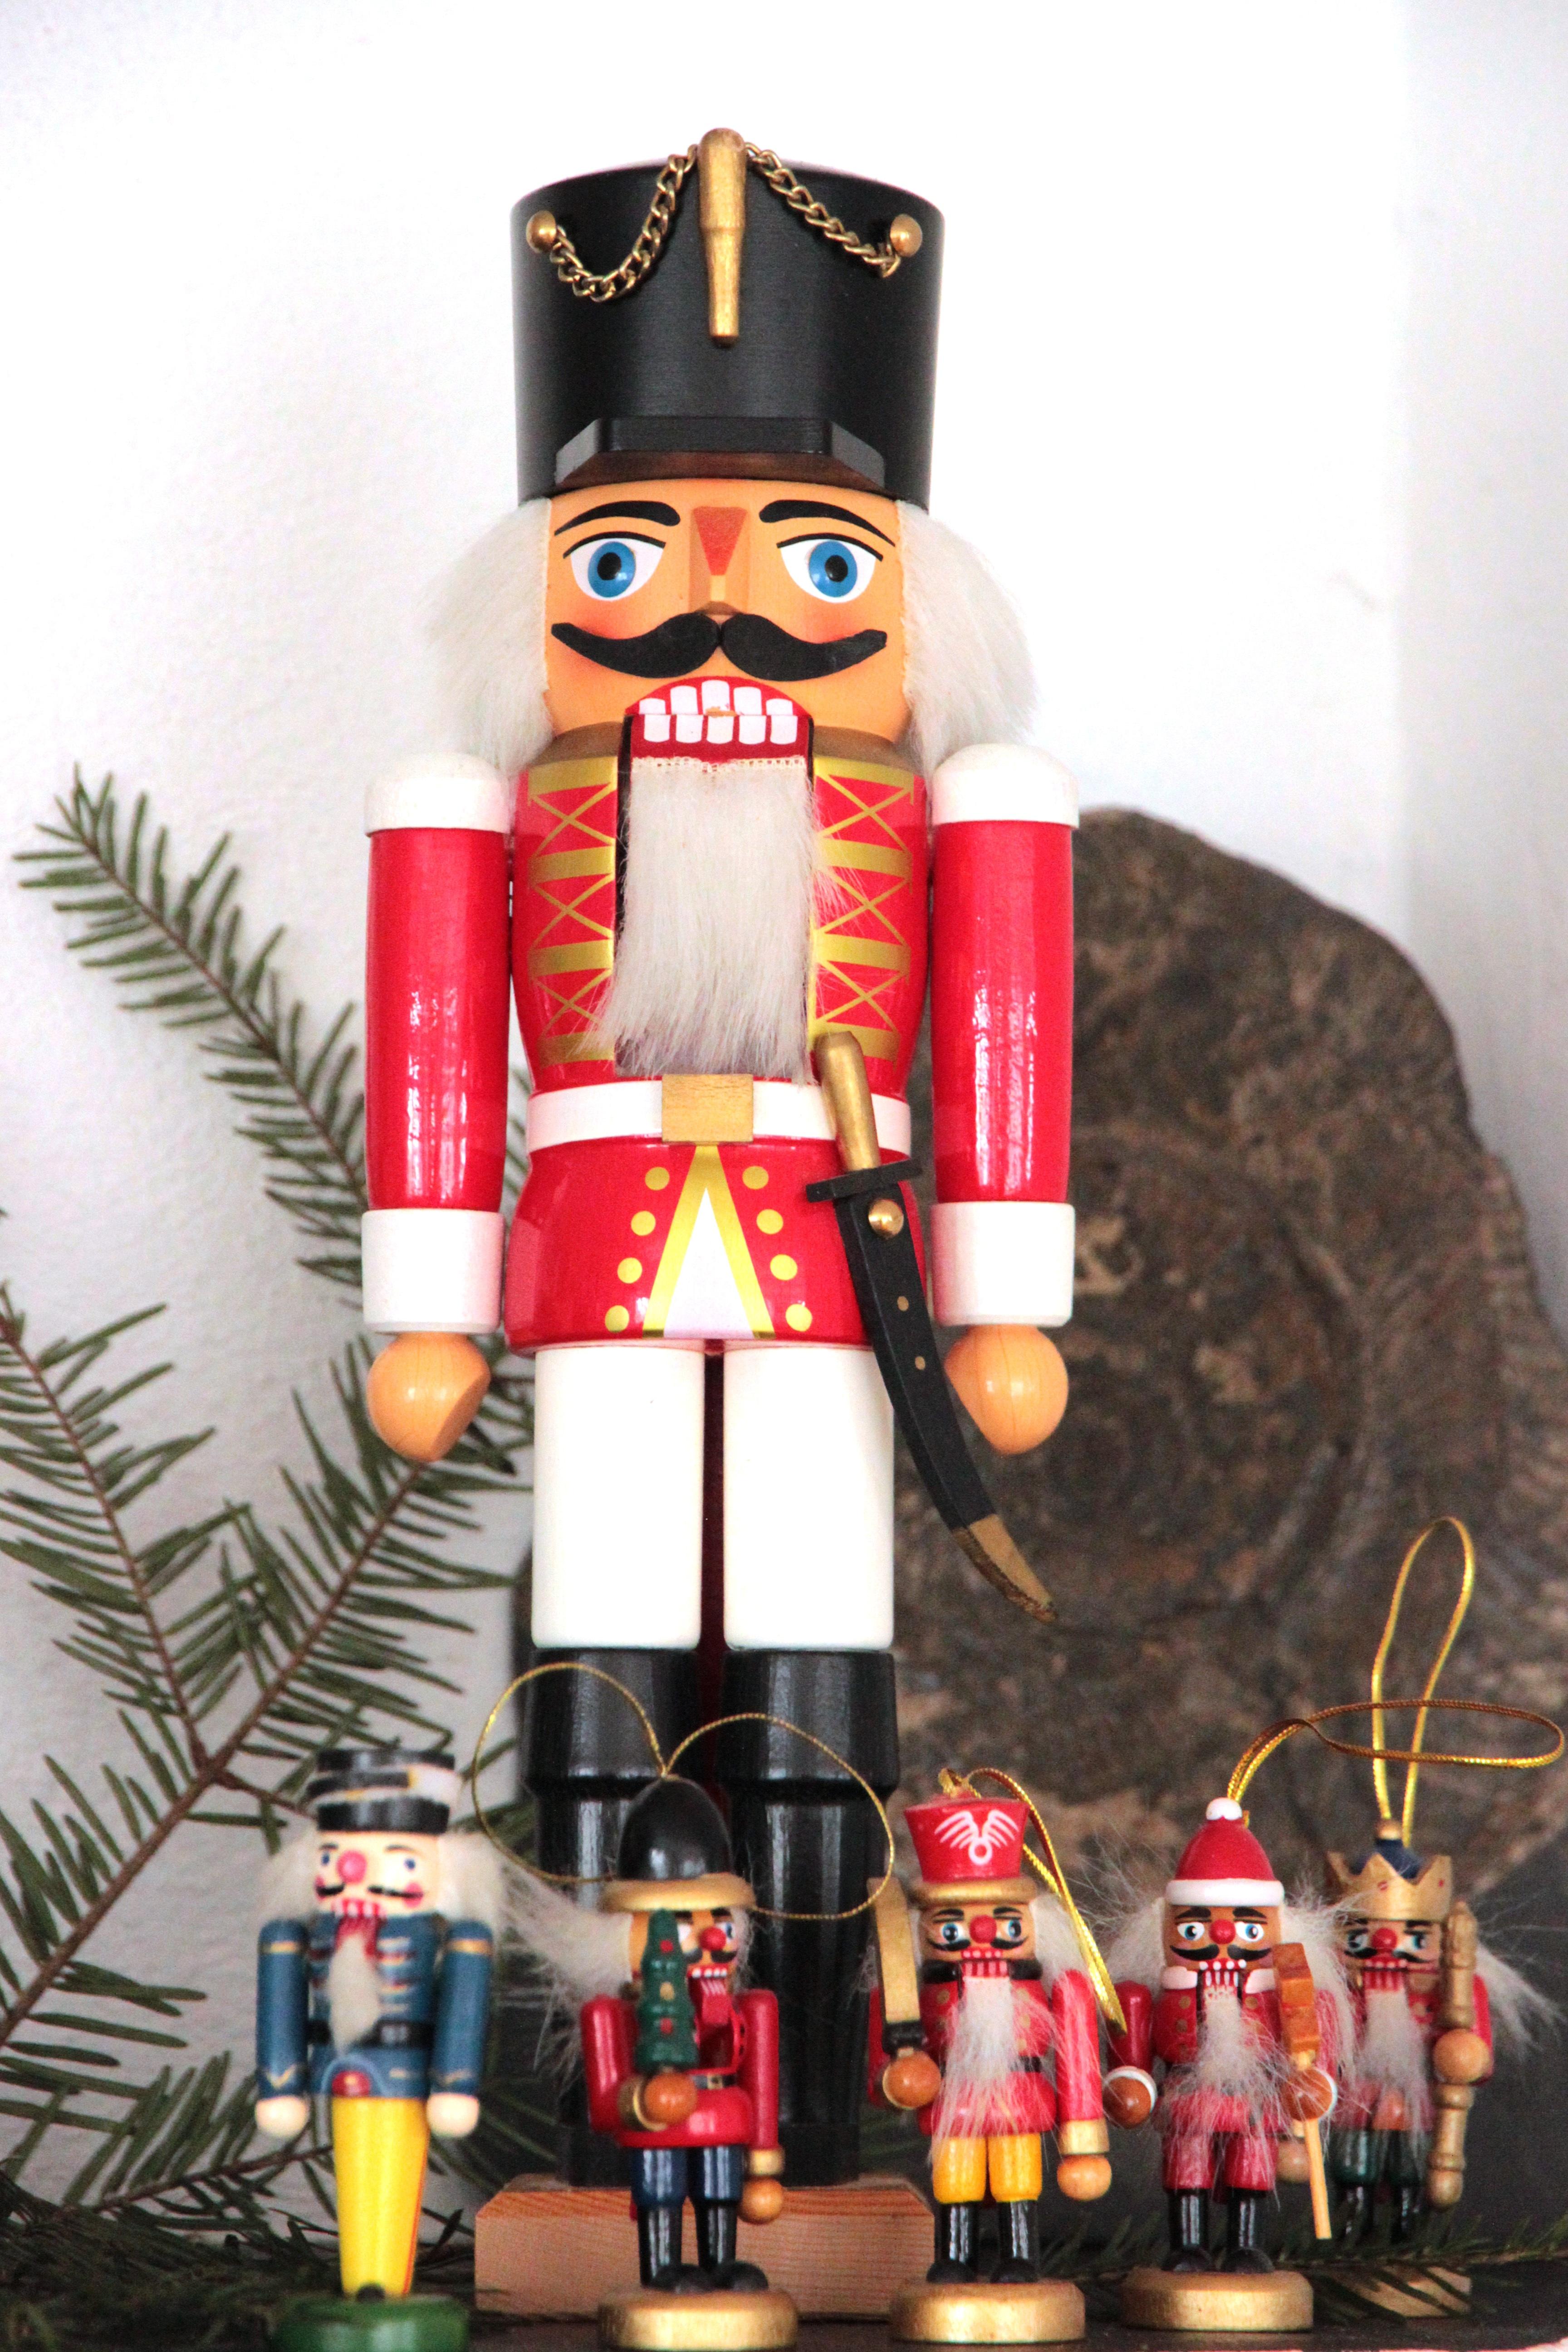 tool decoration christmas decor advent christmas decoration figure festive decorations holzfigur nutcracker ore mountains nutcracker parade